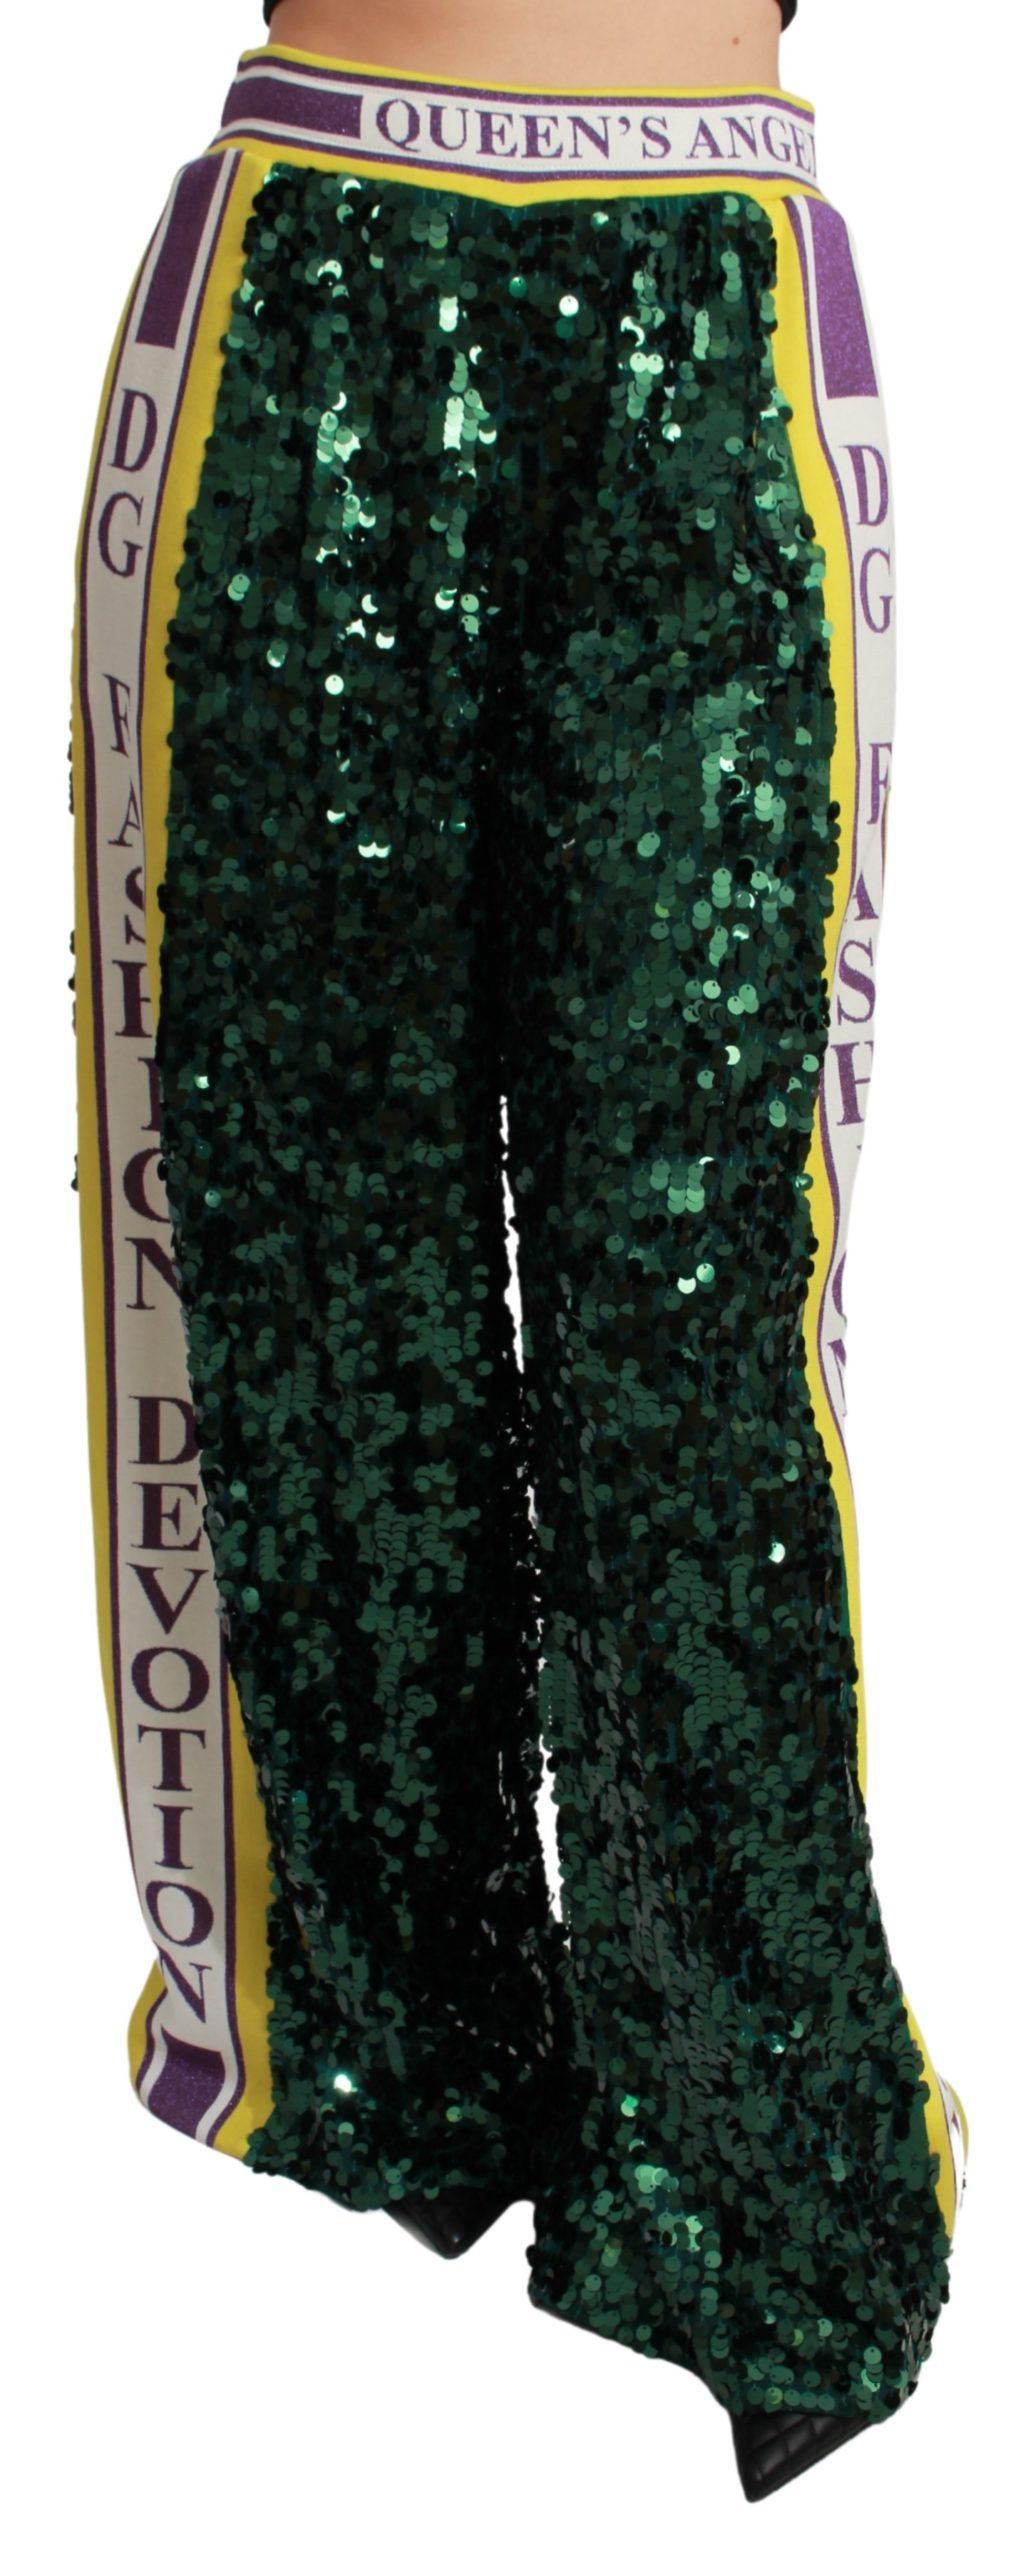 Dolce & Gabbana Women's Sequin Queens Angel Trouser Green PAN71051 - IT36   XS